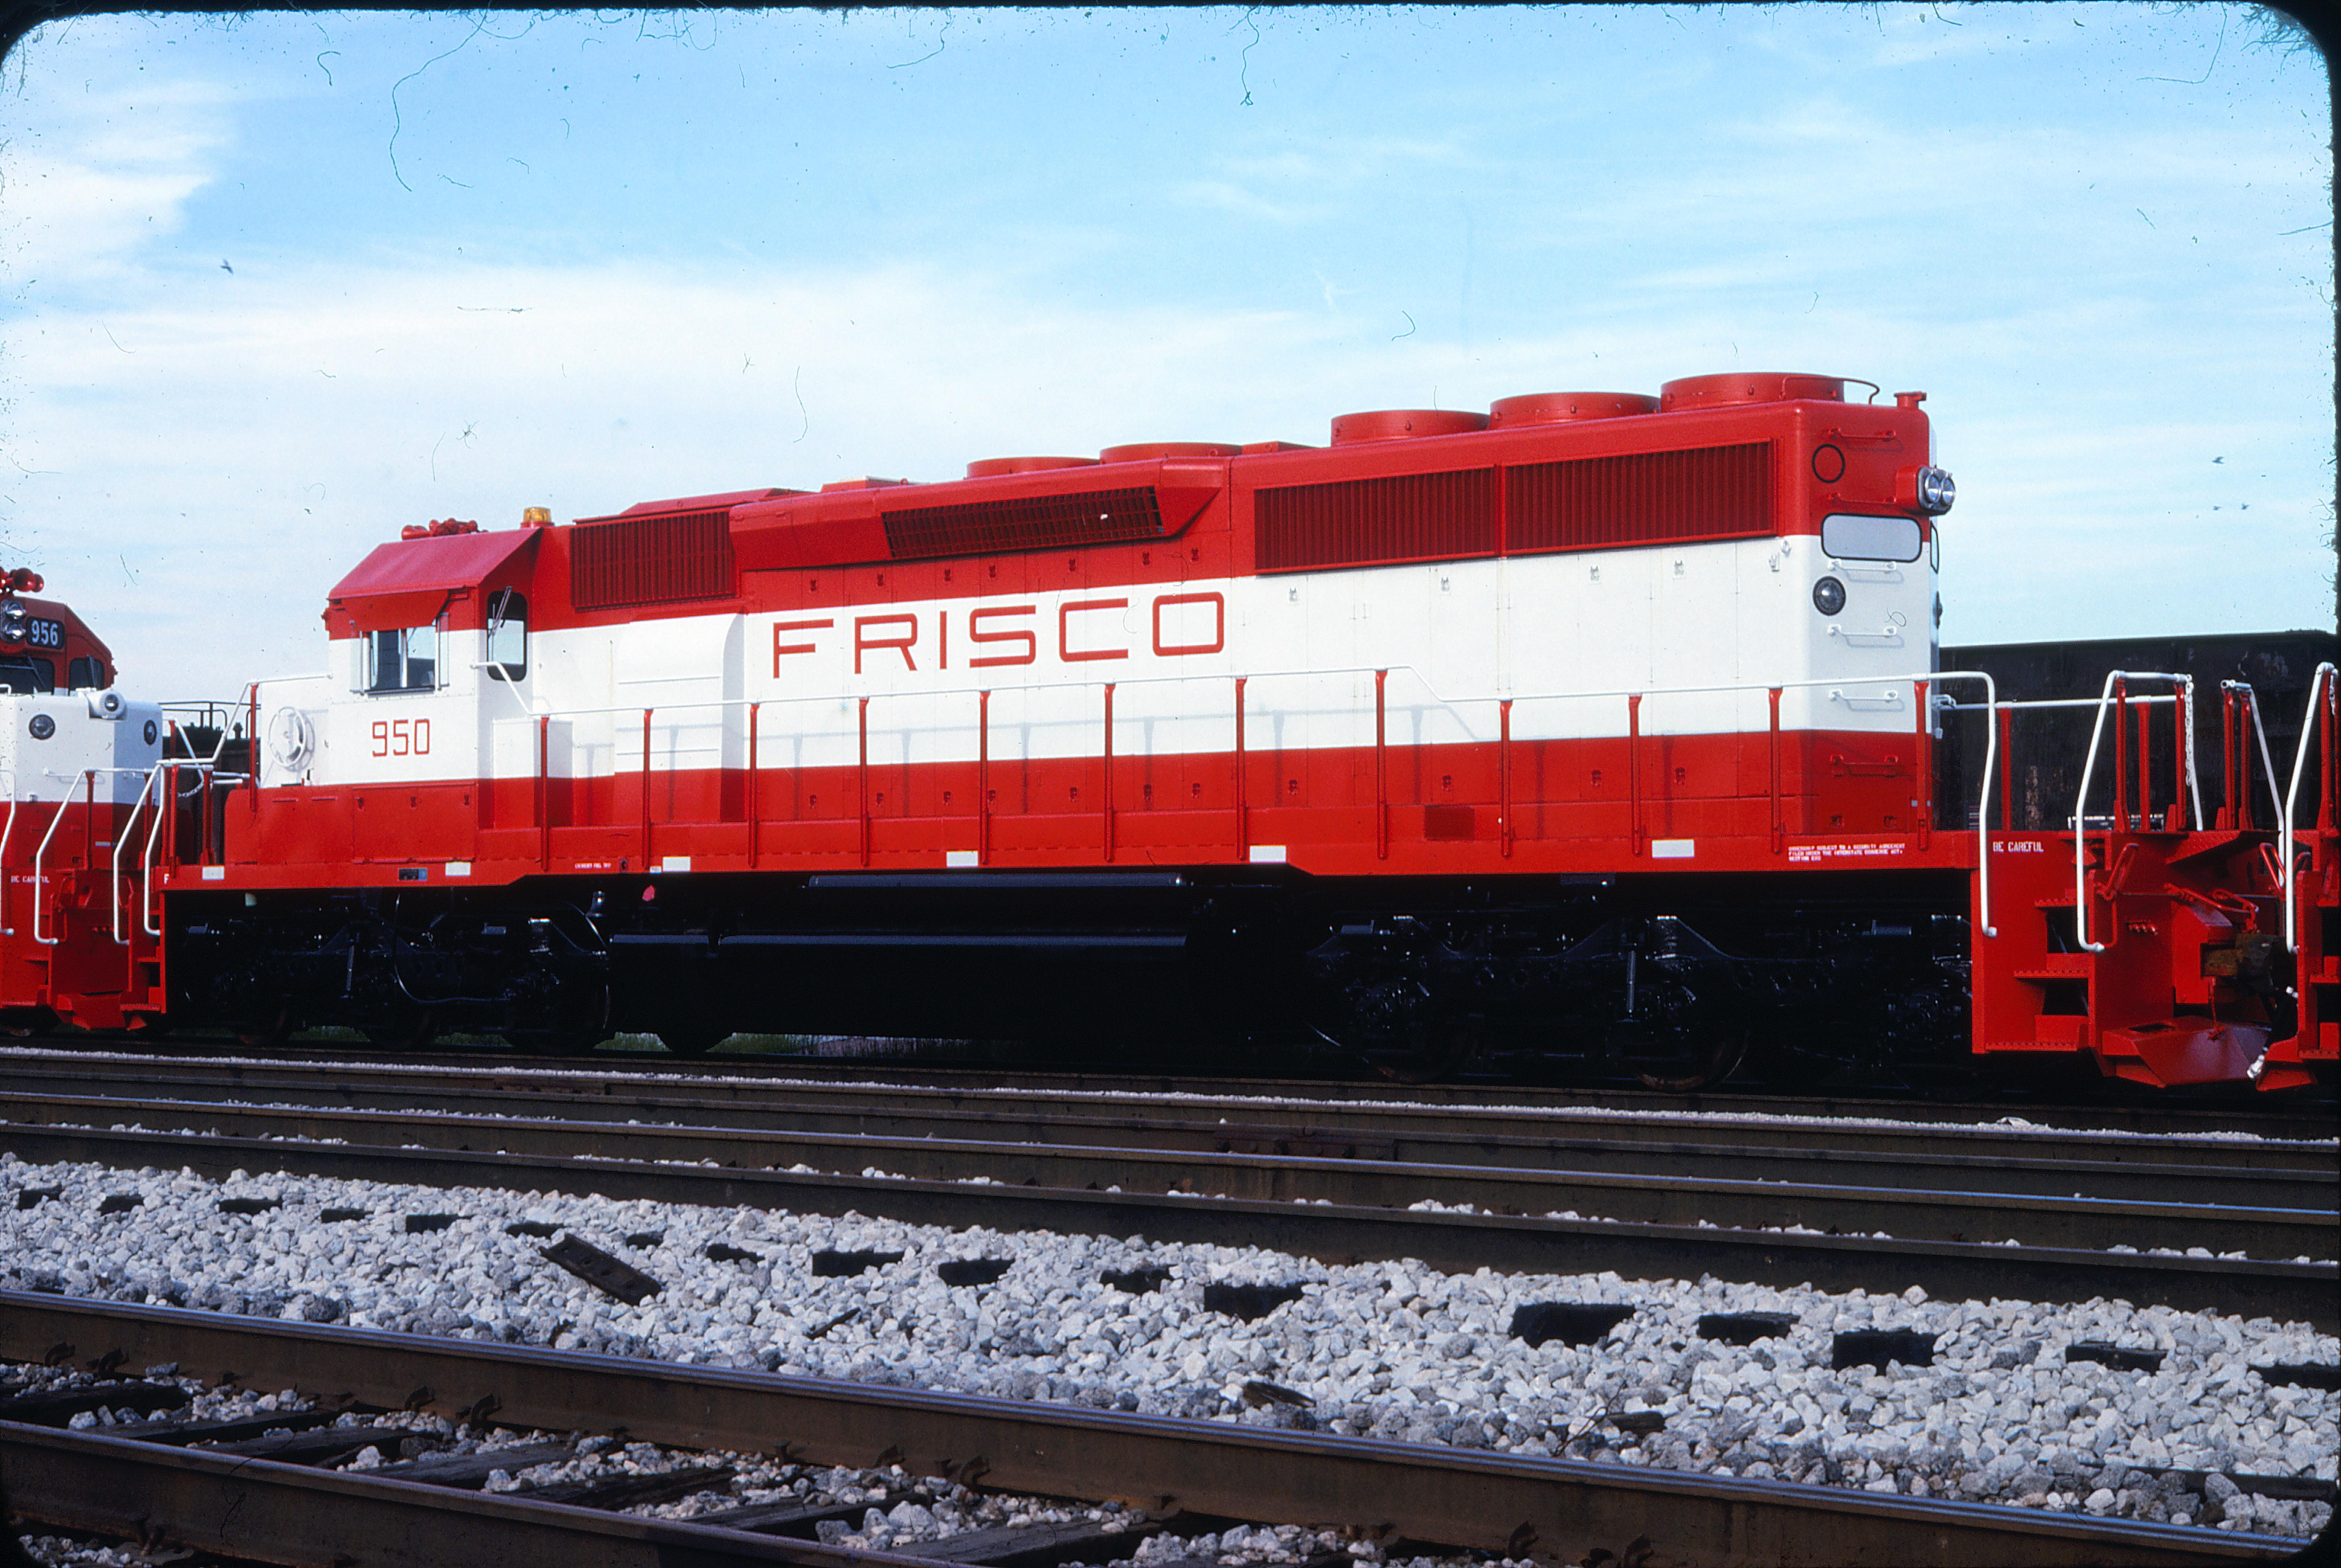 SD40-2 950 at East Hazel Crest, Illinois on July 17, 1978